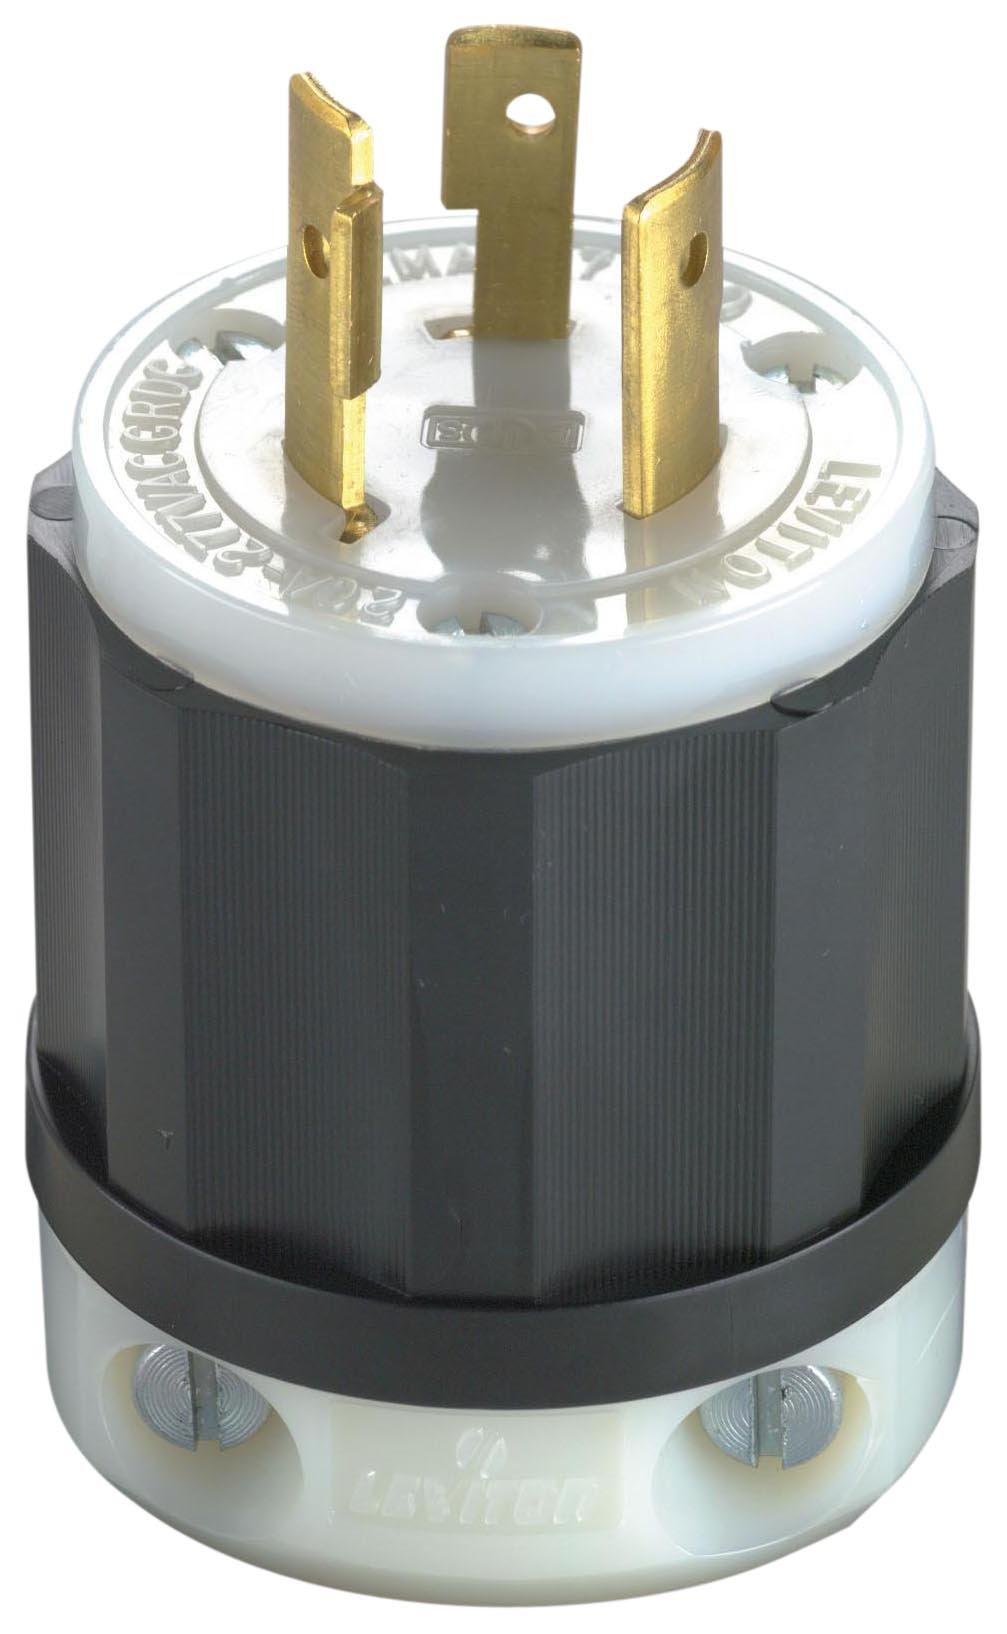 Leviton 2331 20 Amp, 277 Volt, NEMA L7-20P, 2P, 3W, Locking Plug, Industrial Grade, Grounding - Black-White by Hydrofarm (Image #1)